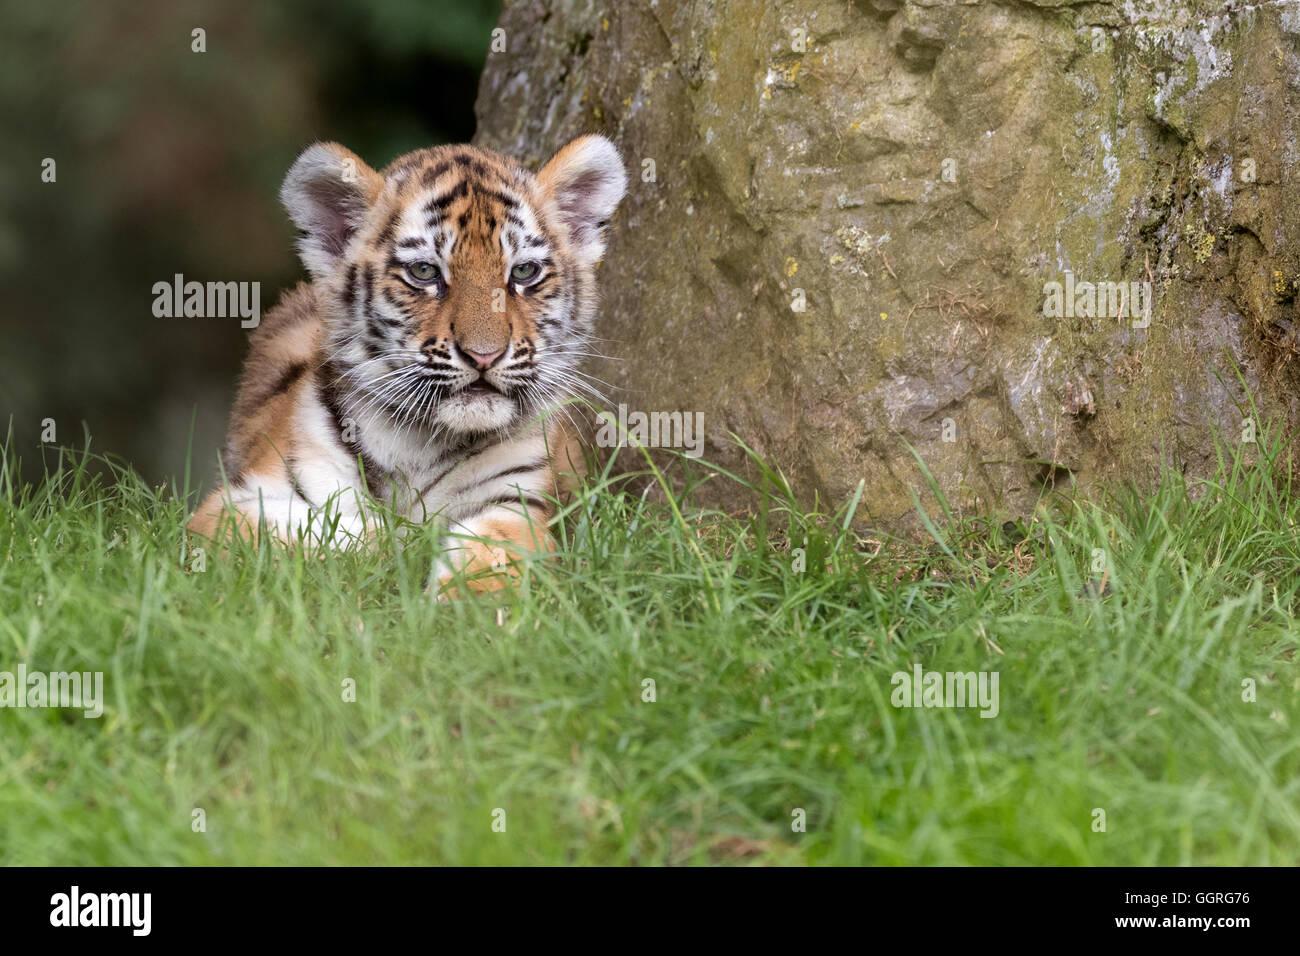 Amur tiger cub, 11 weeks old. - Stock Image